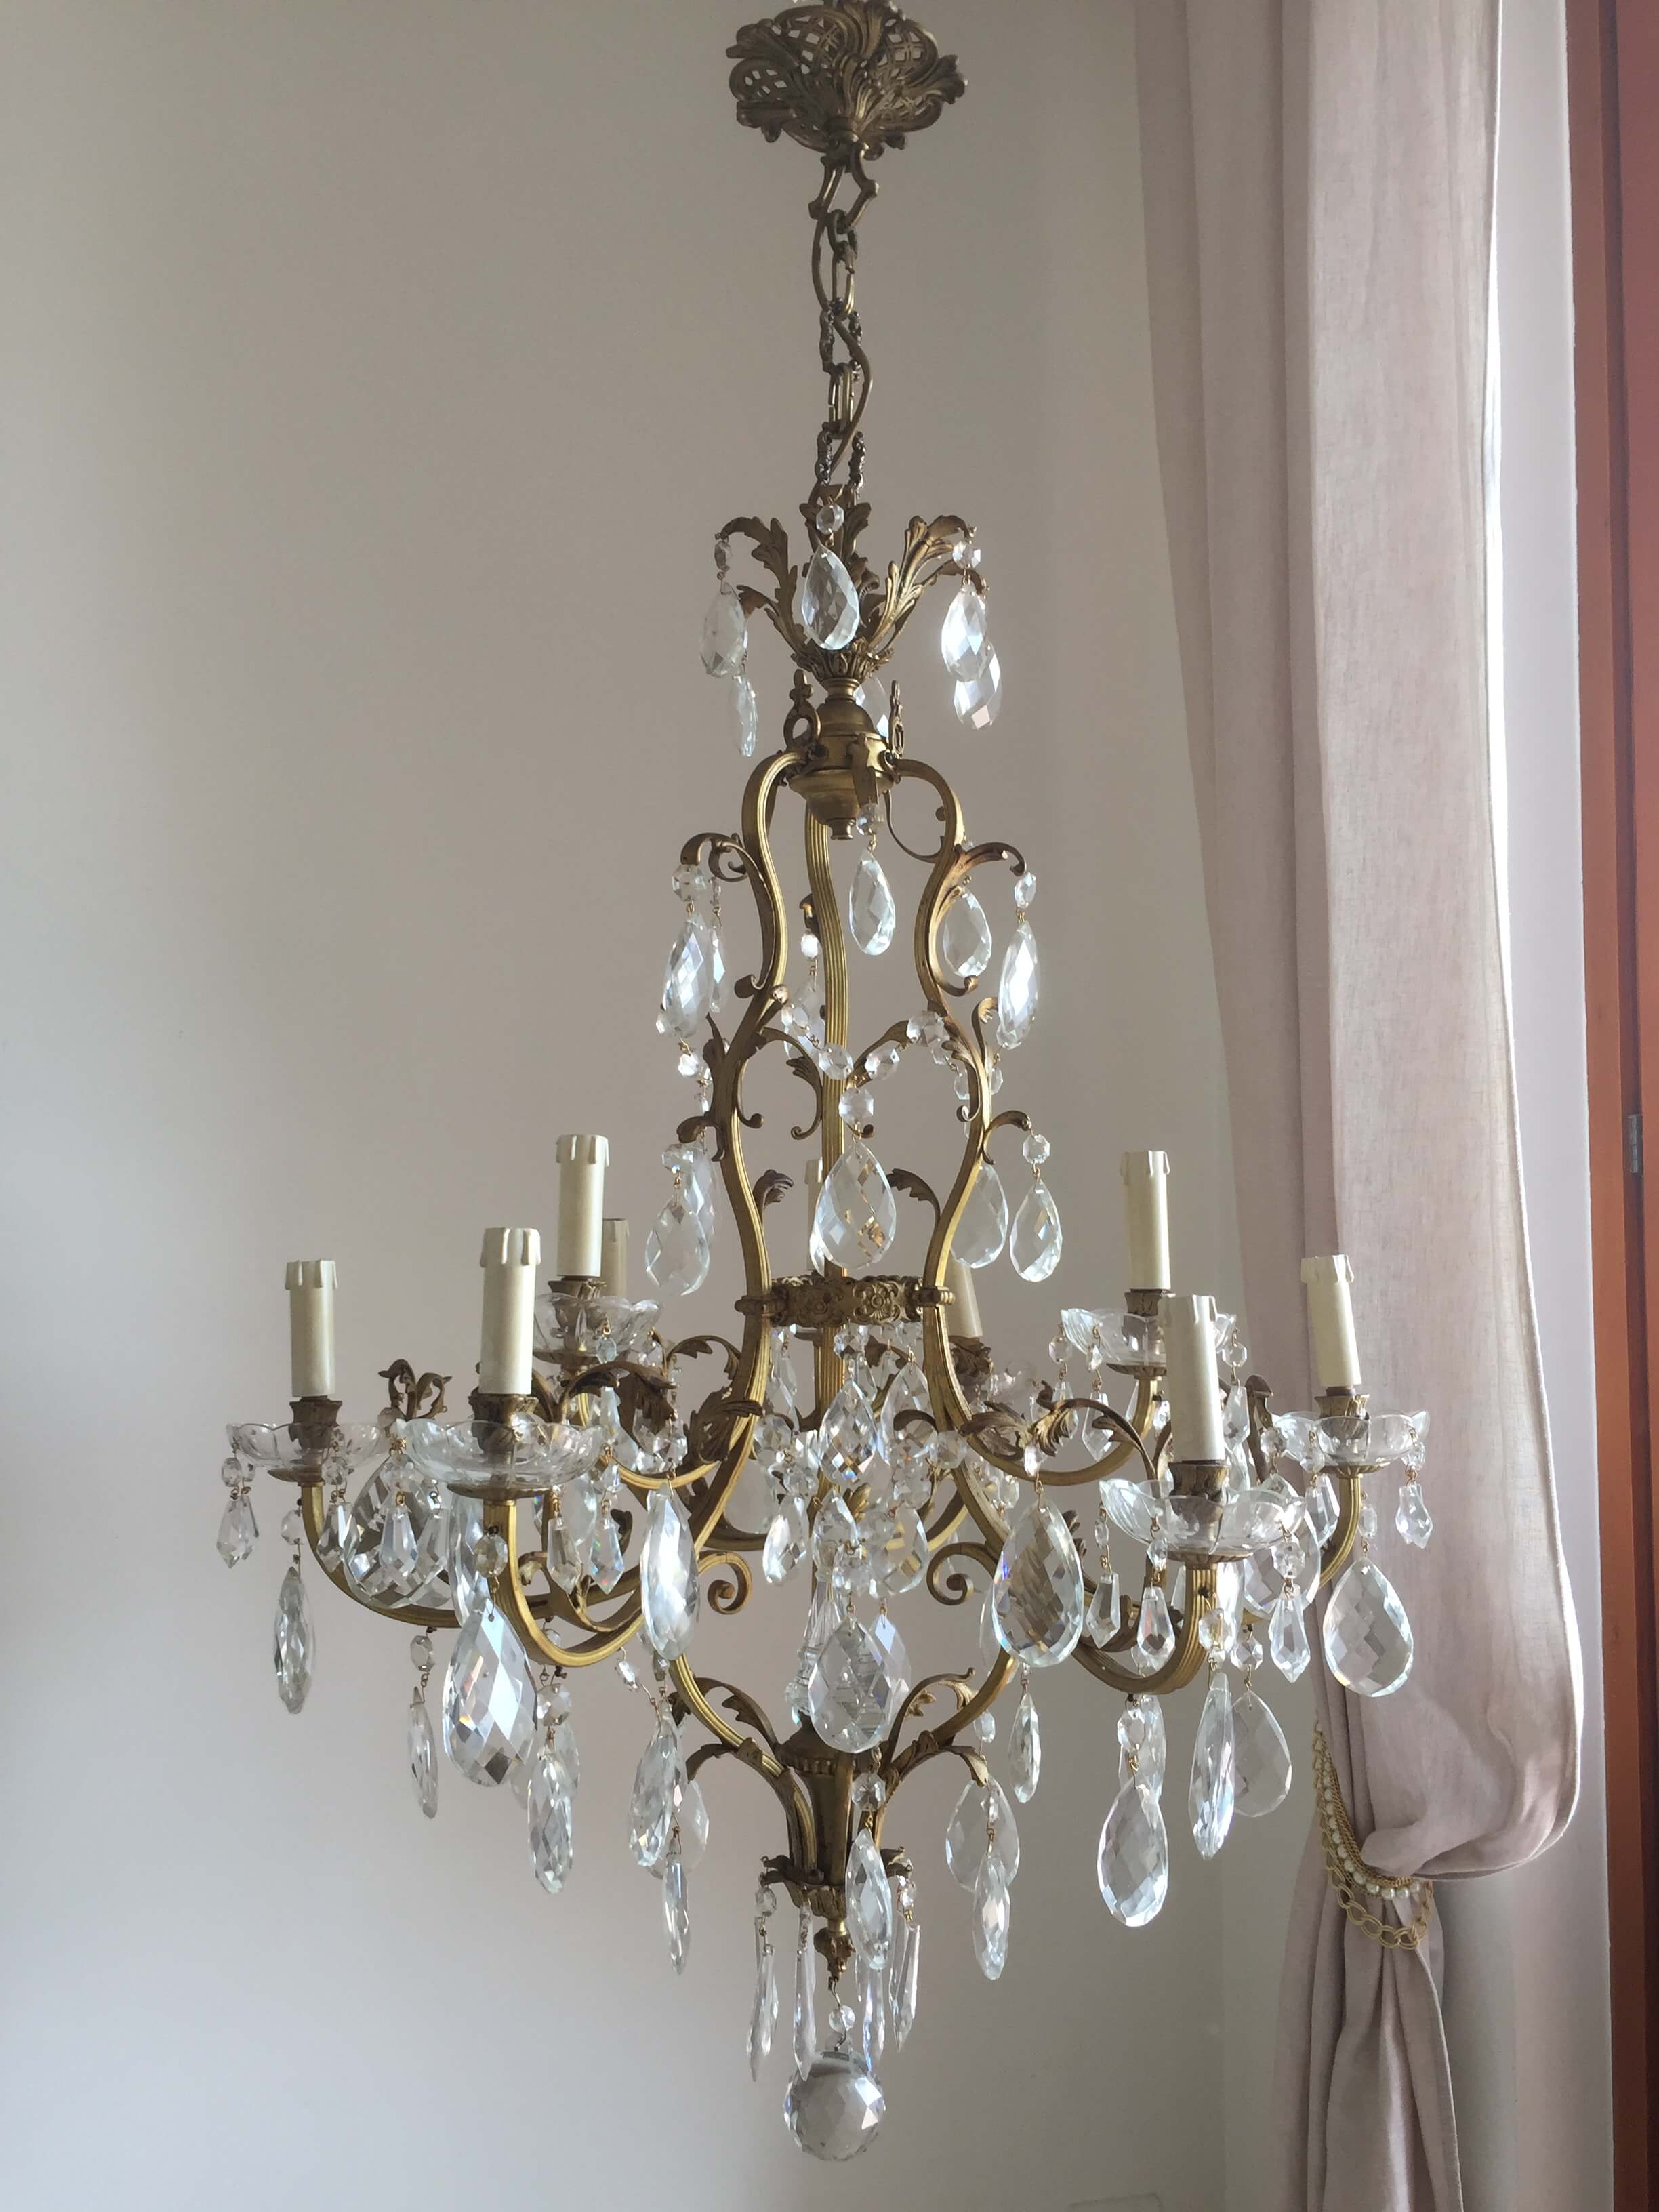 Le rêve de Monaco bronze chandelier